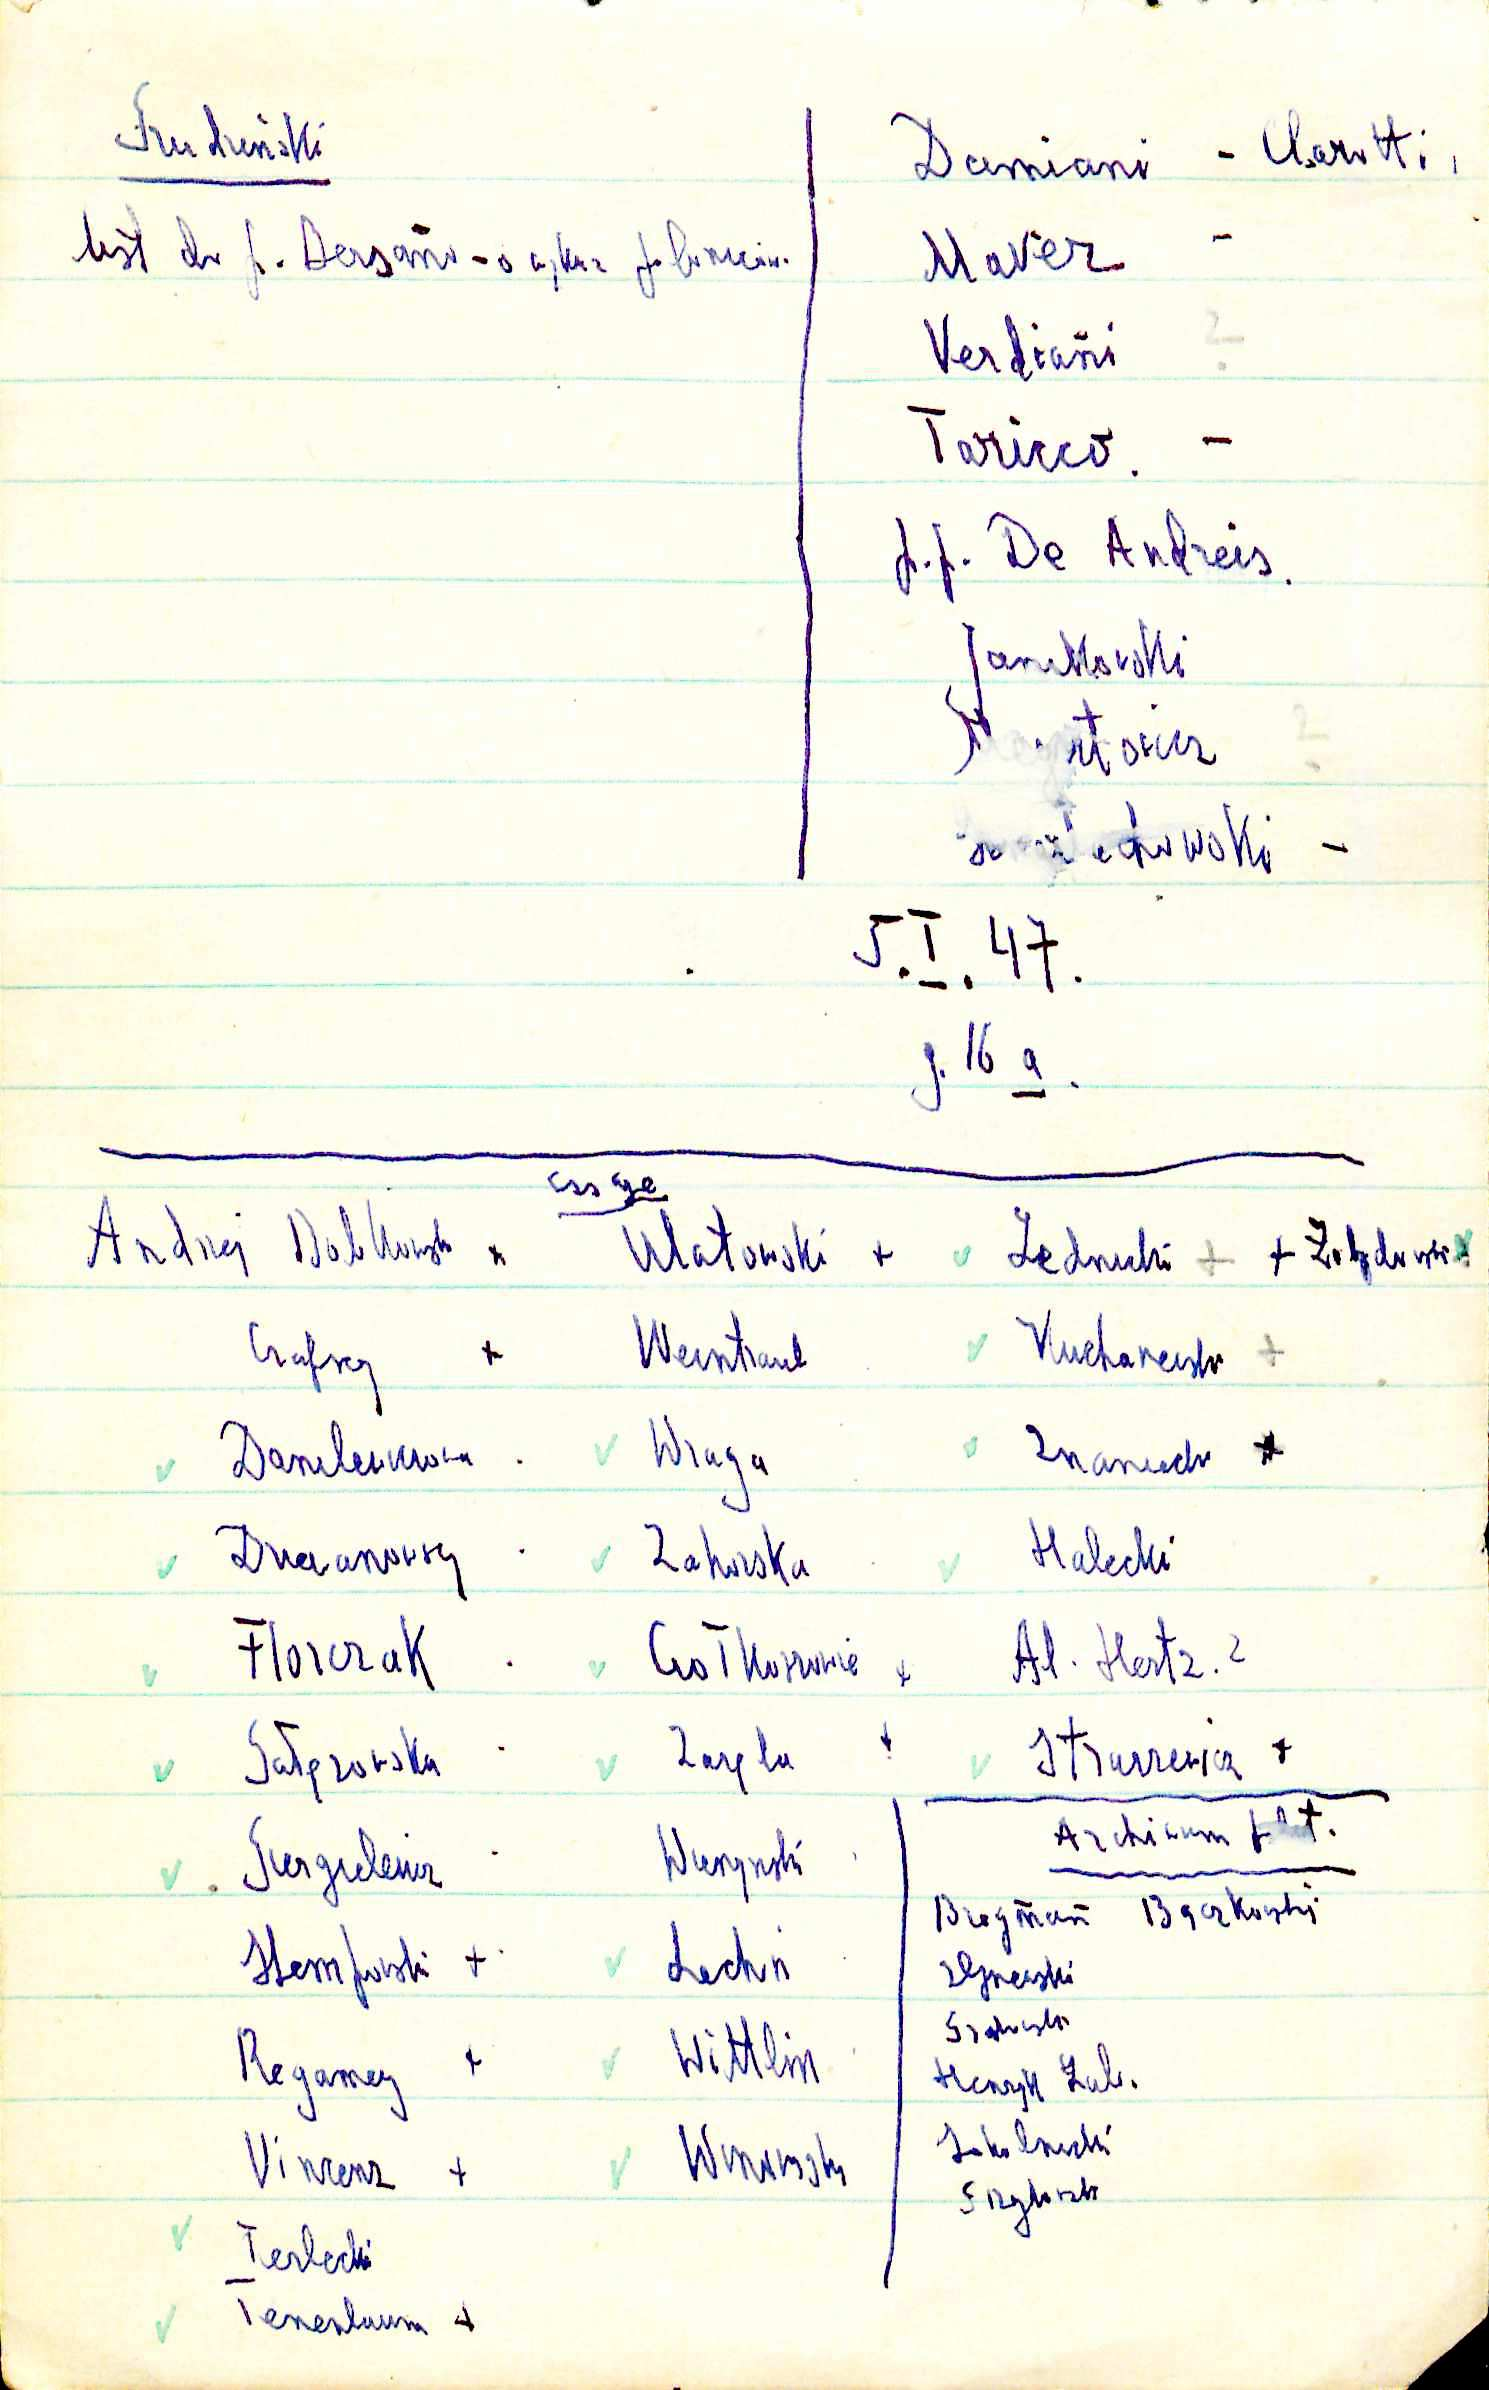 <div class='inner-box'><div class='close-desc'></div><span class='opis'>Reprint – luźne notatki z papierów osobistych Jerzego Giedroycia, syg. PoJG 03.02</span><div class='clearfix'></div><span>Cote du document reprint2</span><div class='clearfix'></div><span>© Instytut Literacki</span></div>